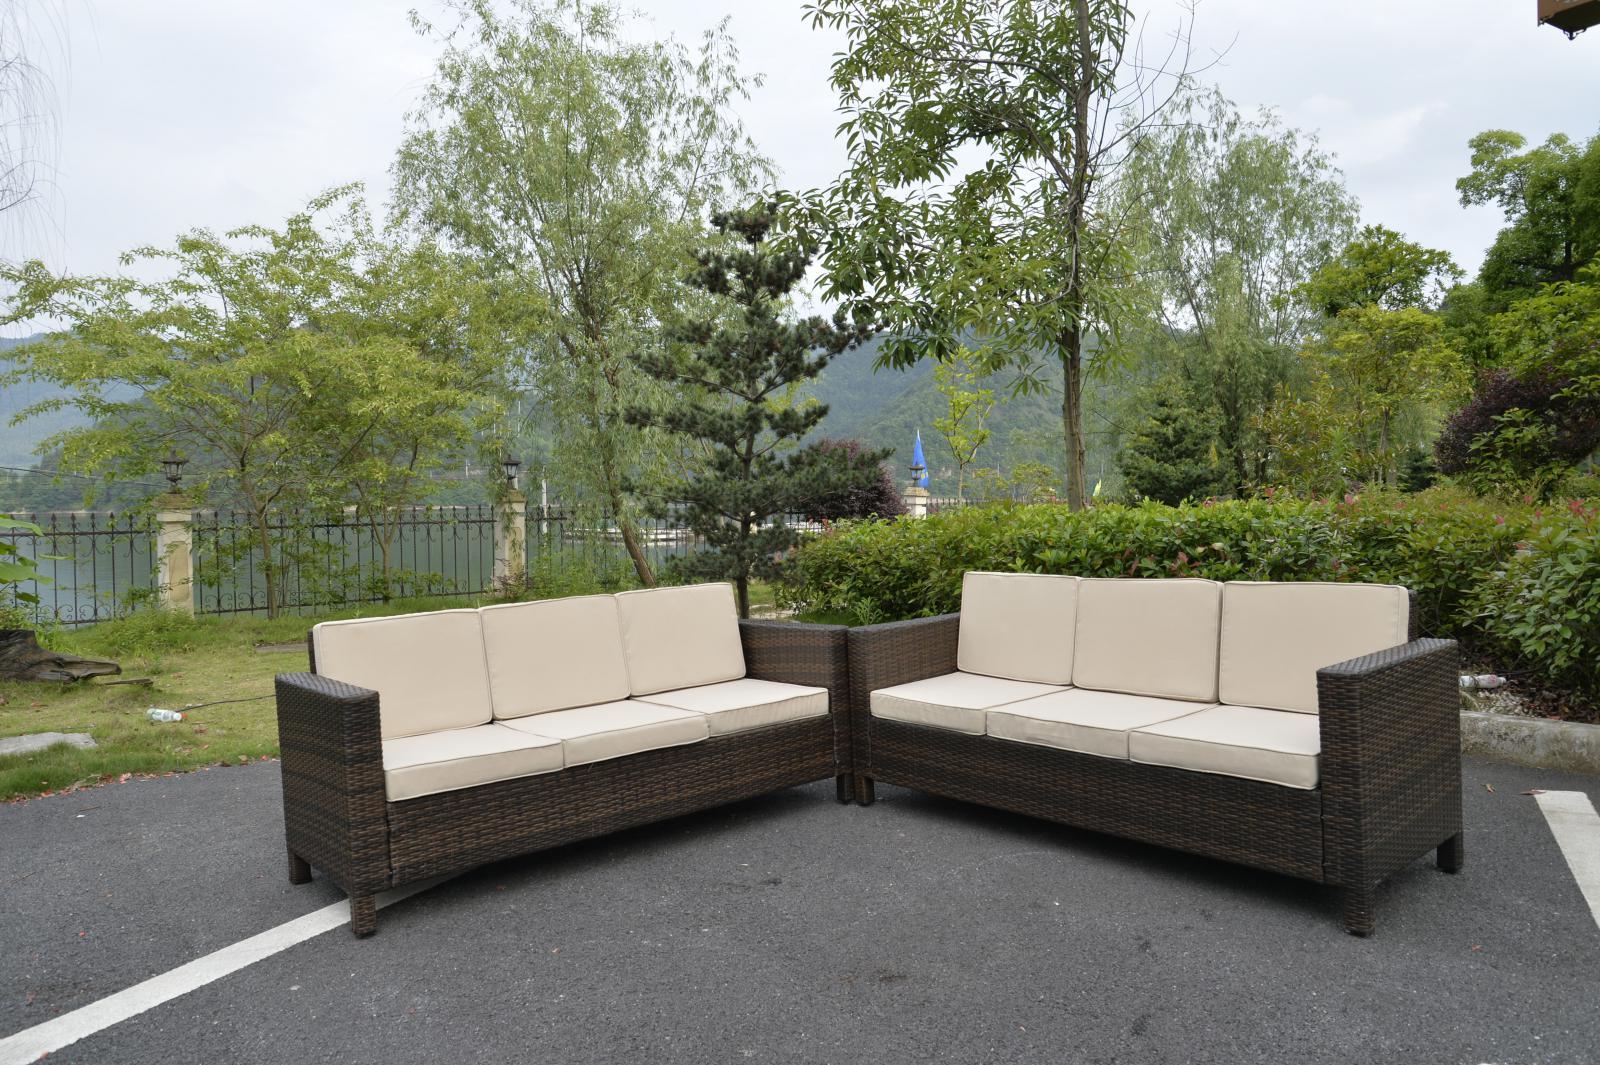 Rattan Garden Furniture Set Sofa Outdoor Conservatory Patio Wicker Table Corn